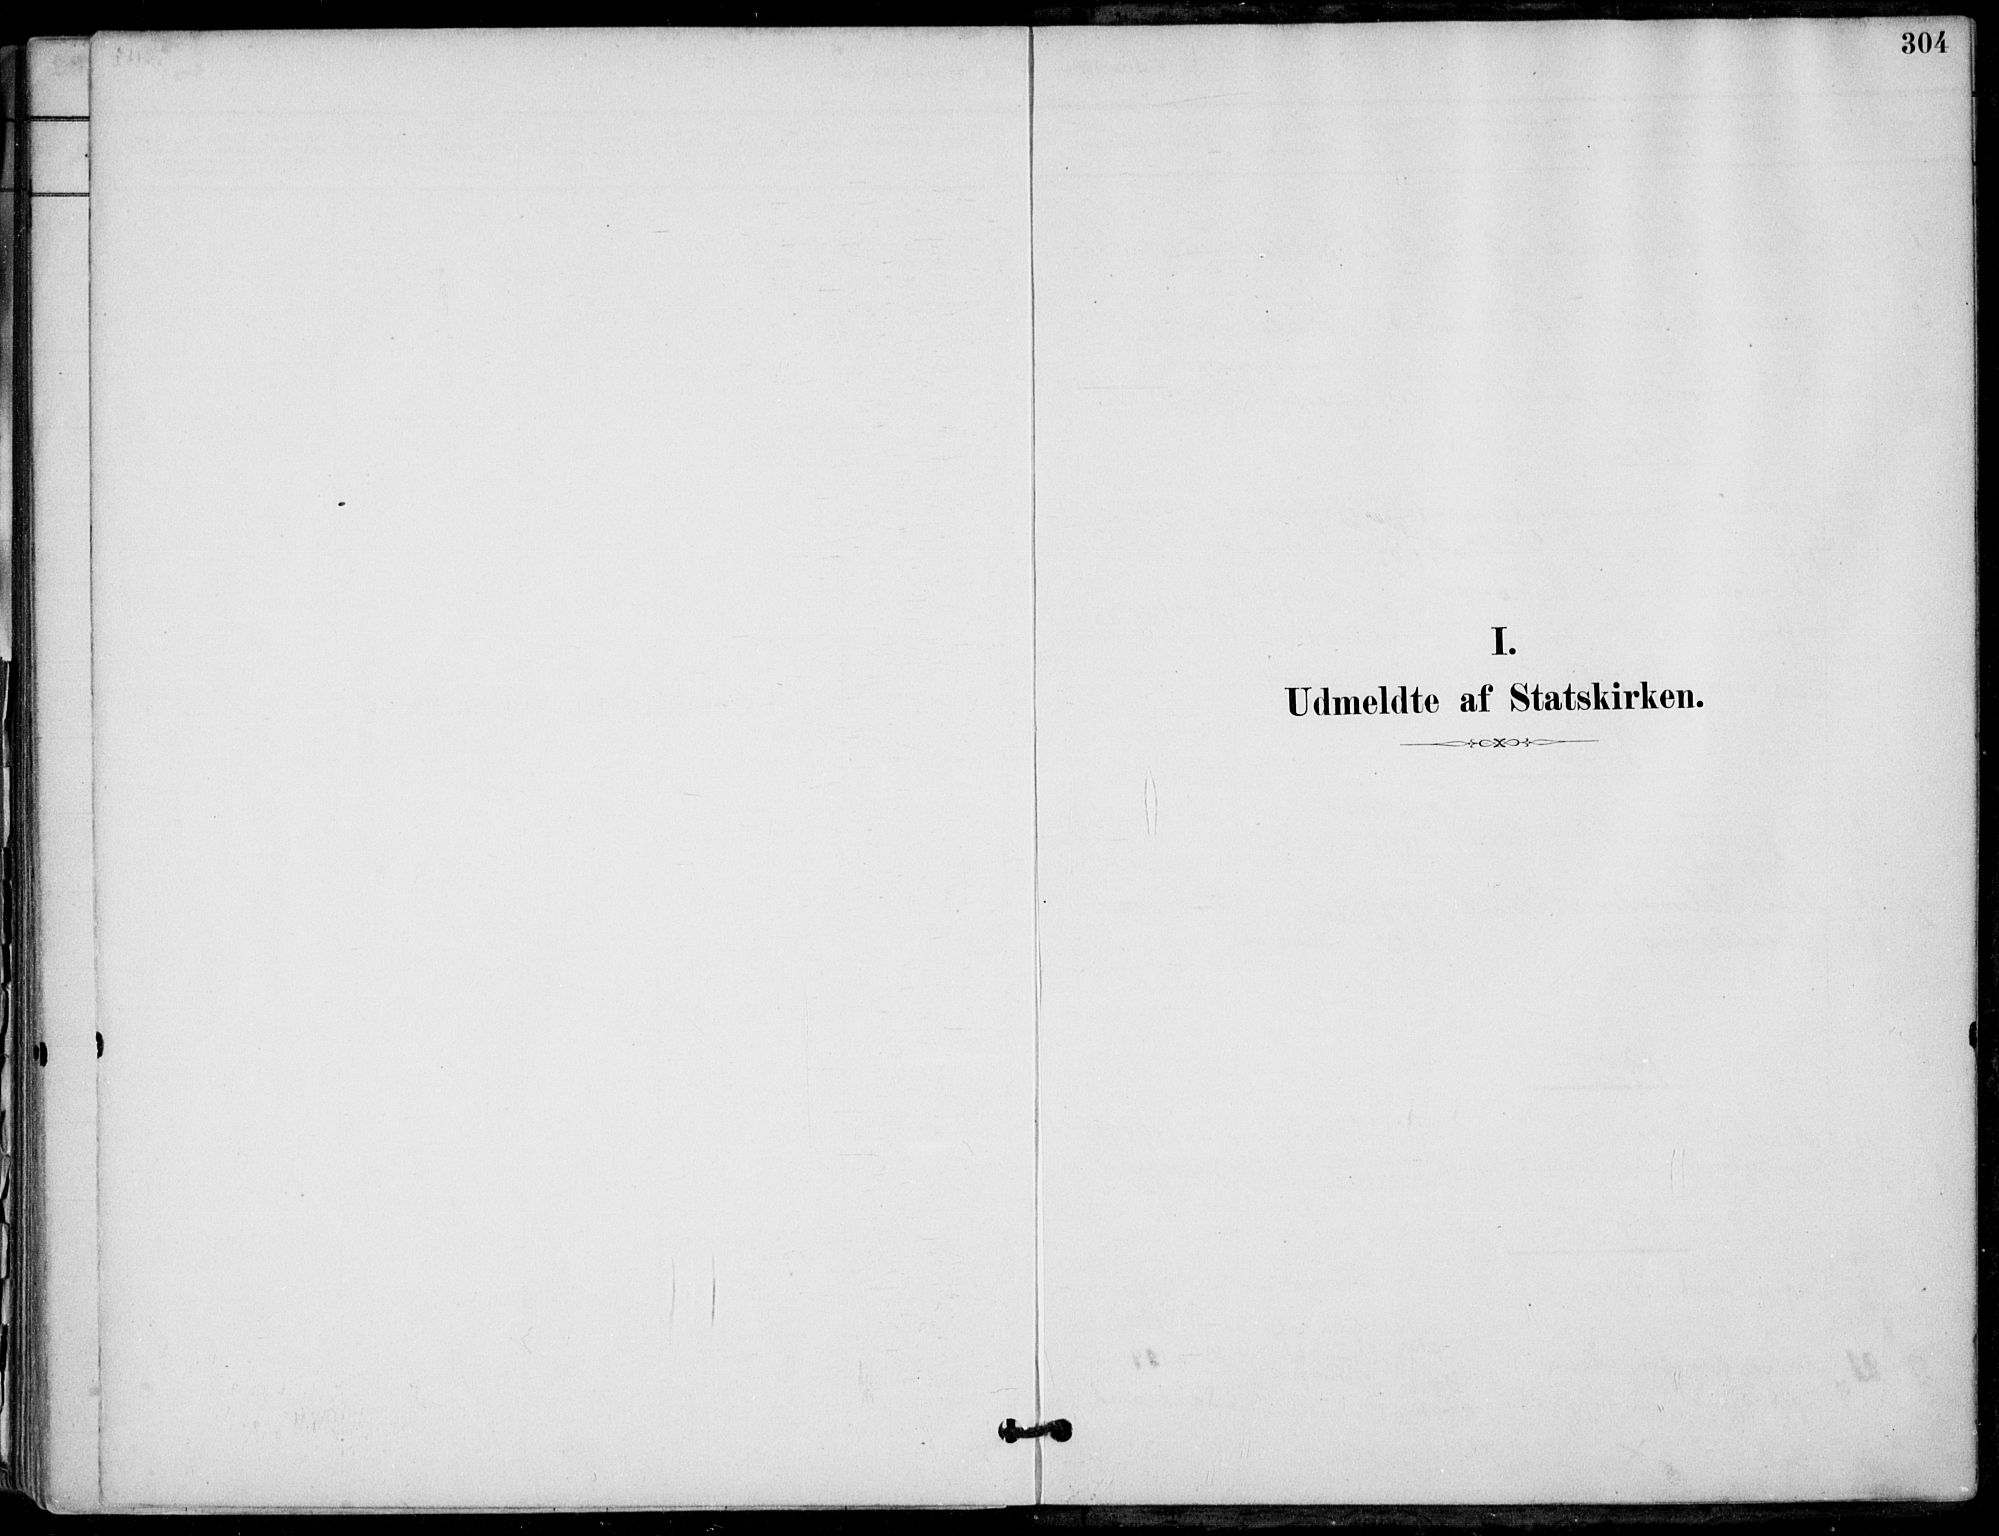 SAKO, Hjartdal kirkebøker, F/Fb/L0002: Ministerialbok nr. II 2, 1880-1932, s. 304